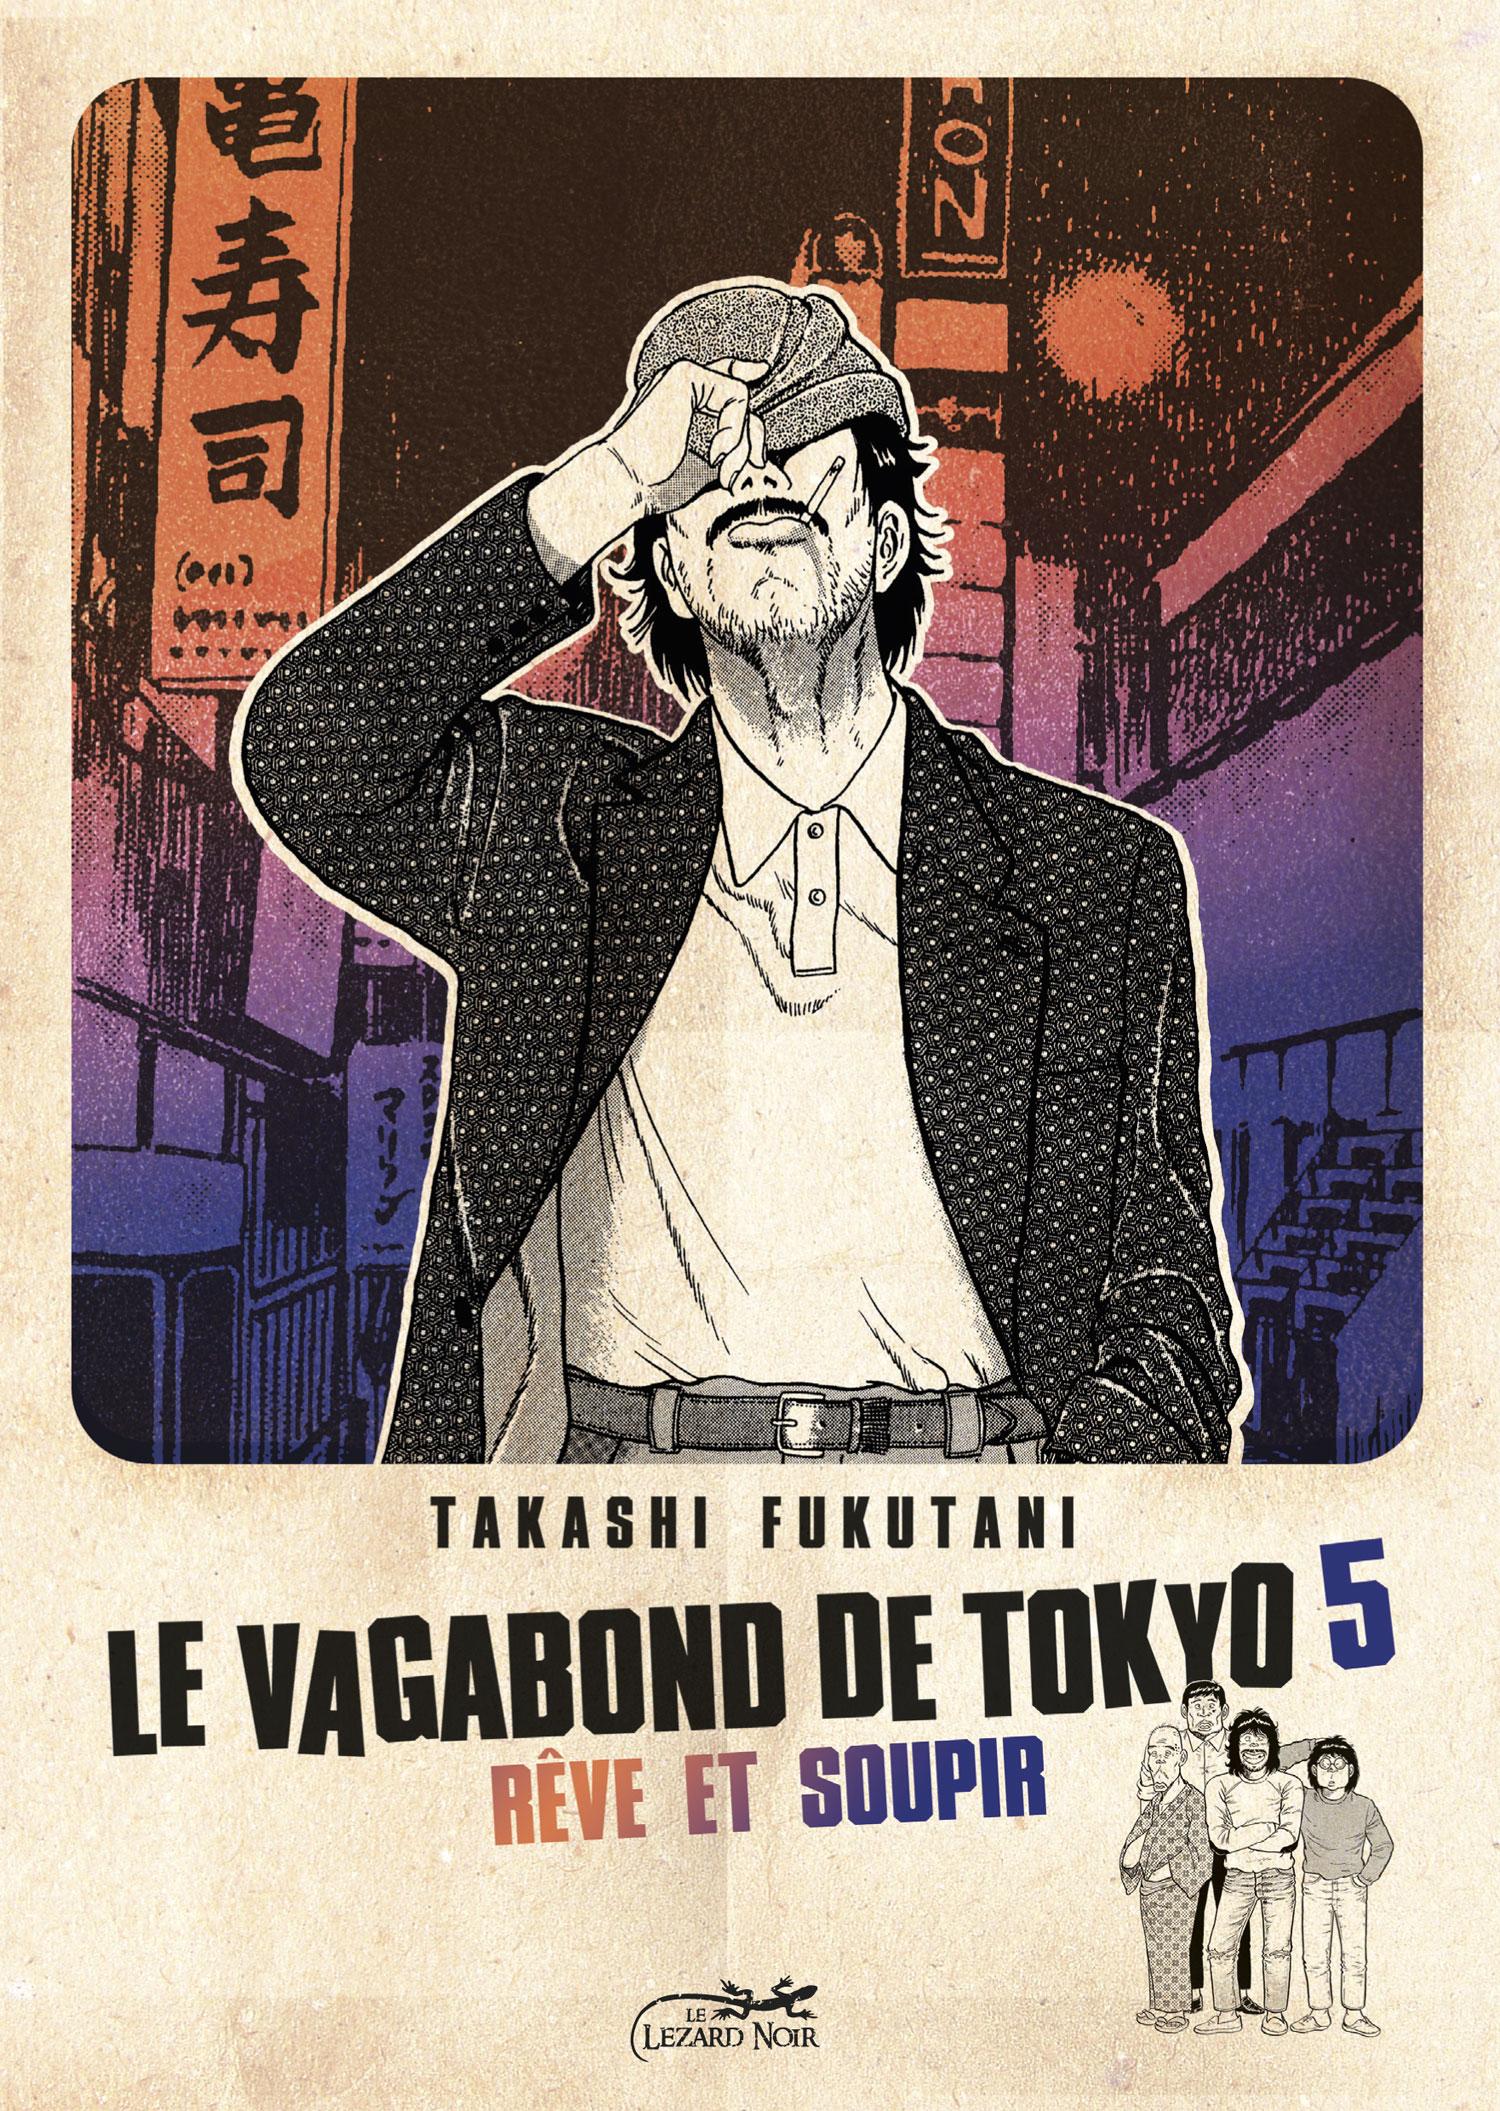 Le Vagabond de Tokyo 5